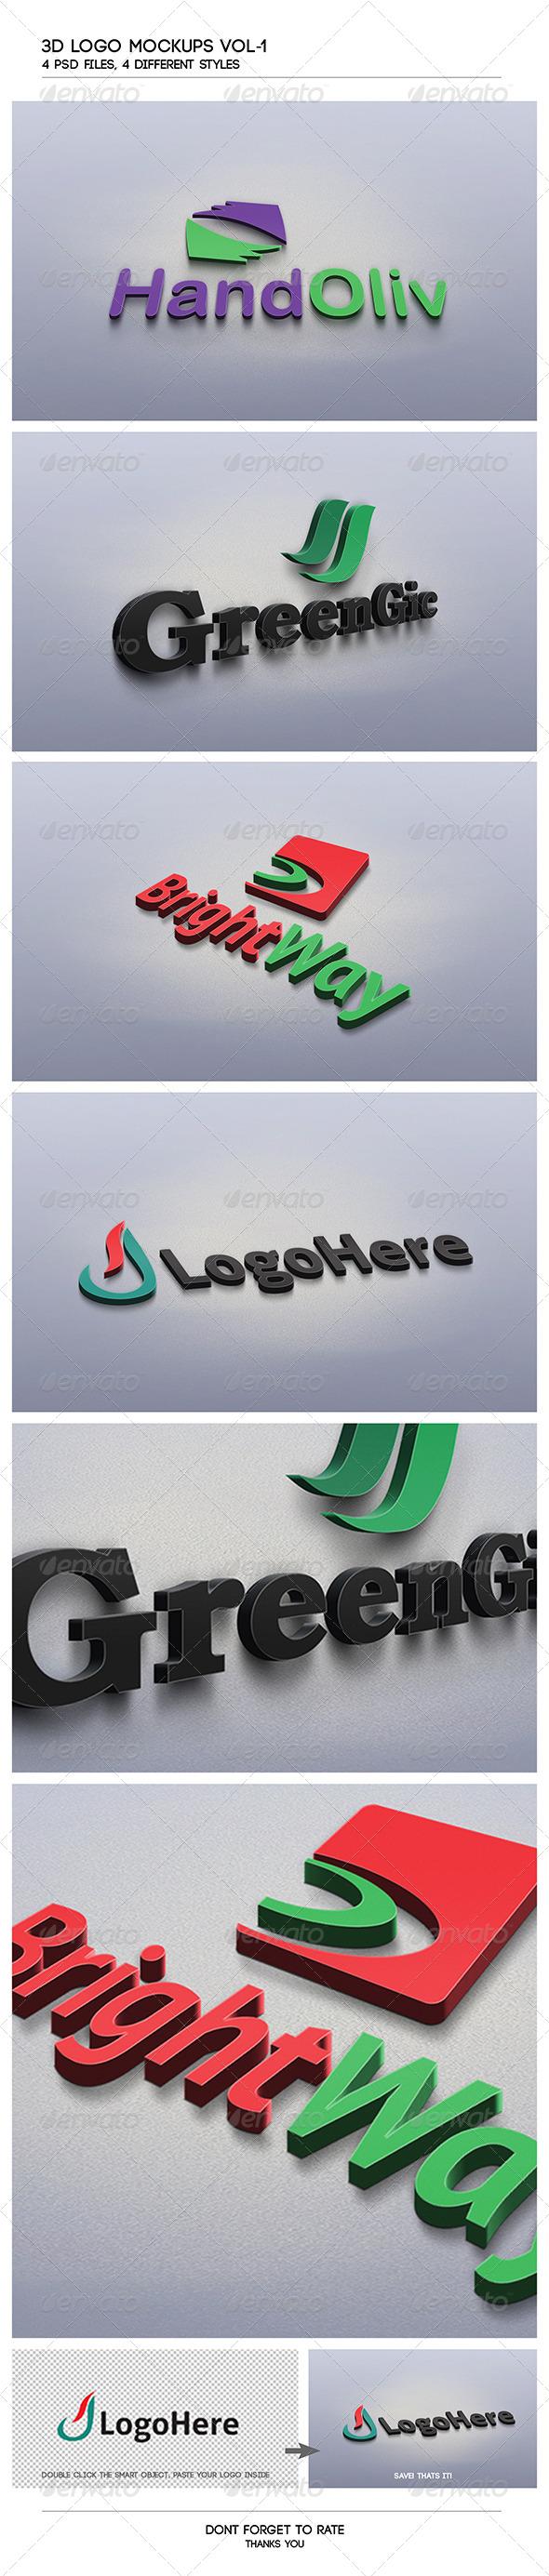 GraphicRiver 3D Logo Mockups Vol.1 4236715